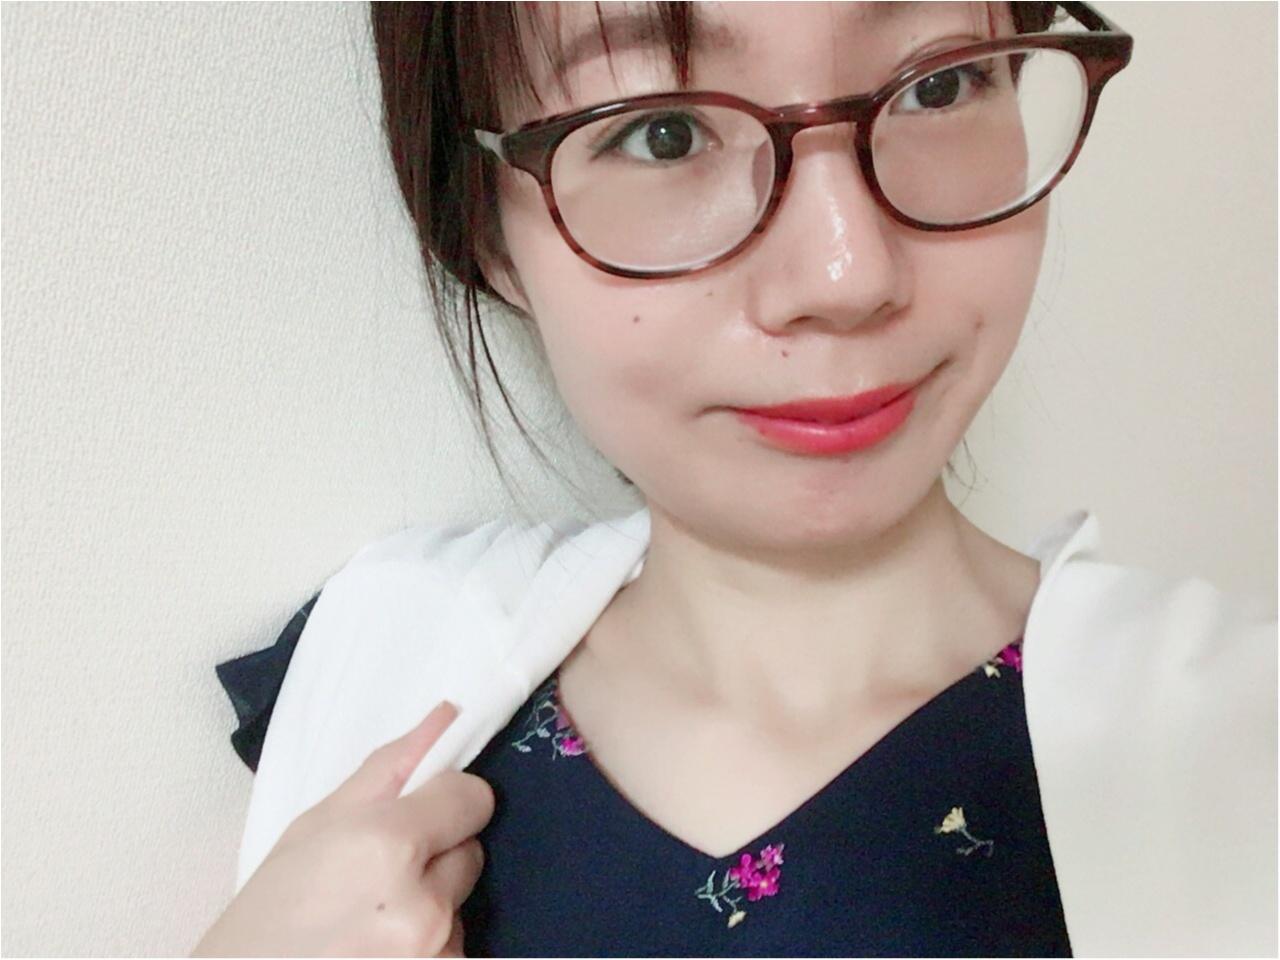 【SALE】プリプラ!《Honeys》可愛い♡流行り刺繍ブラウスと定番白カーディガンを♡_7